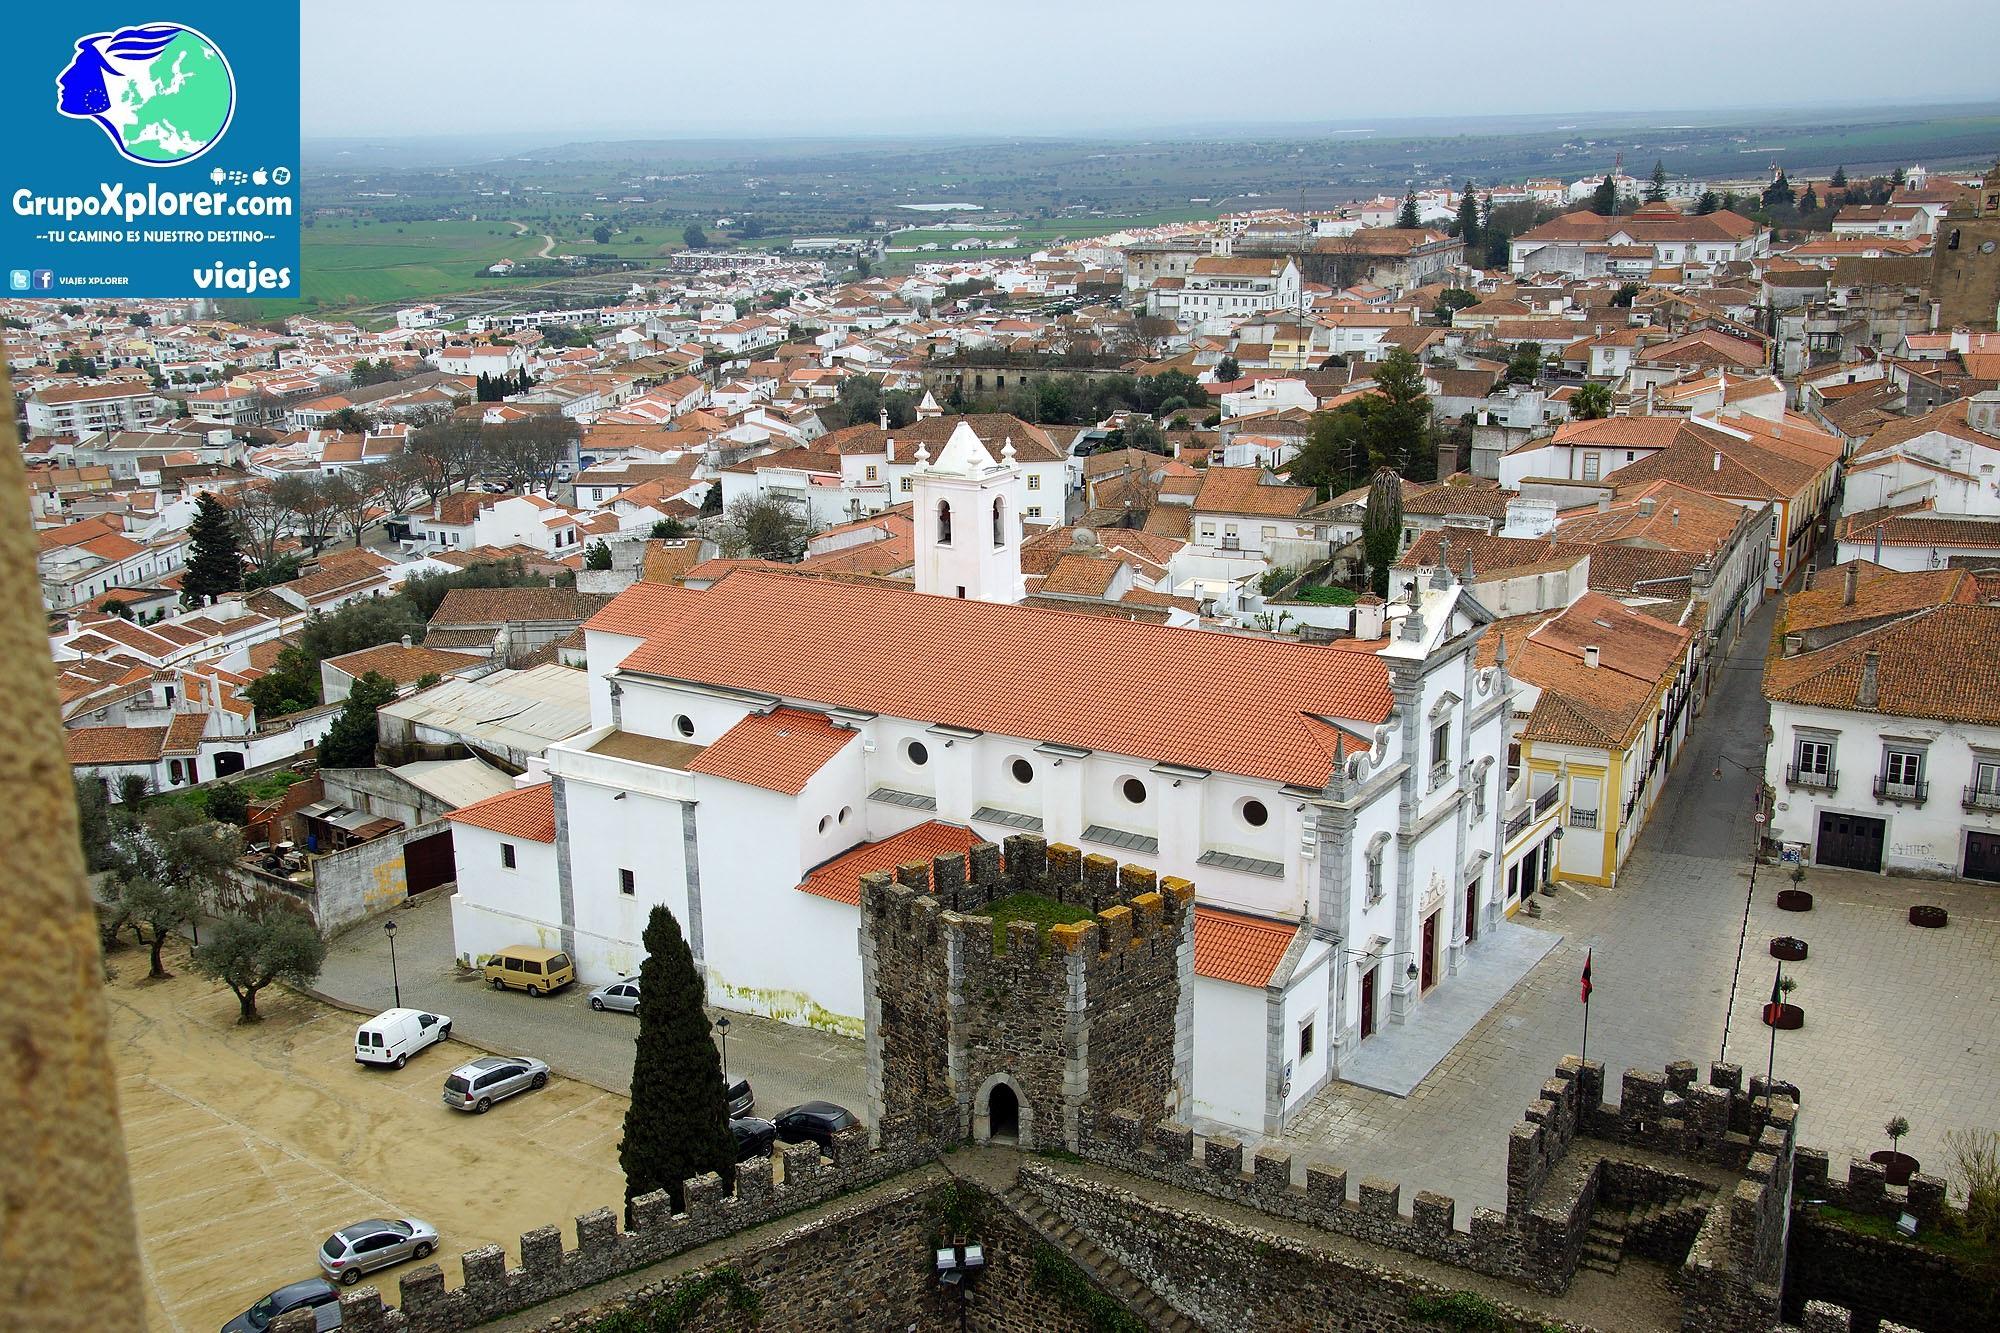 Portugal_DSC04469_-_BEJA_(33810301175)